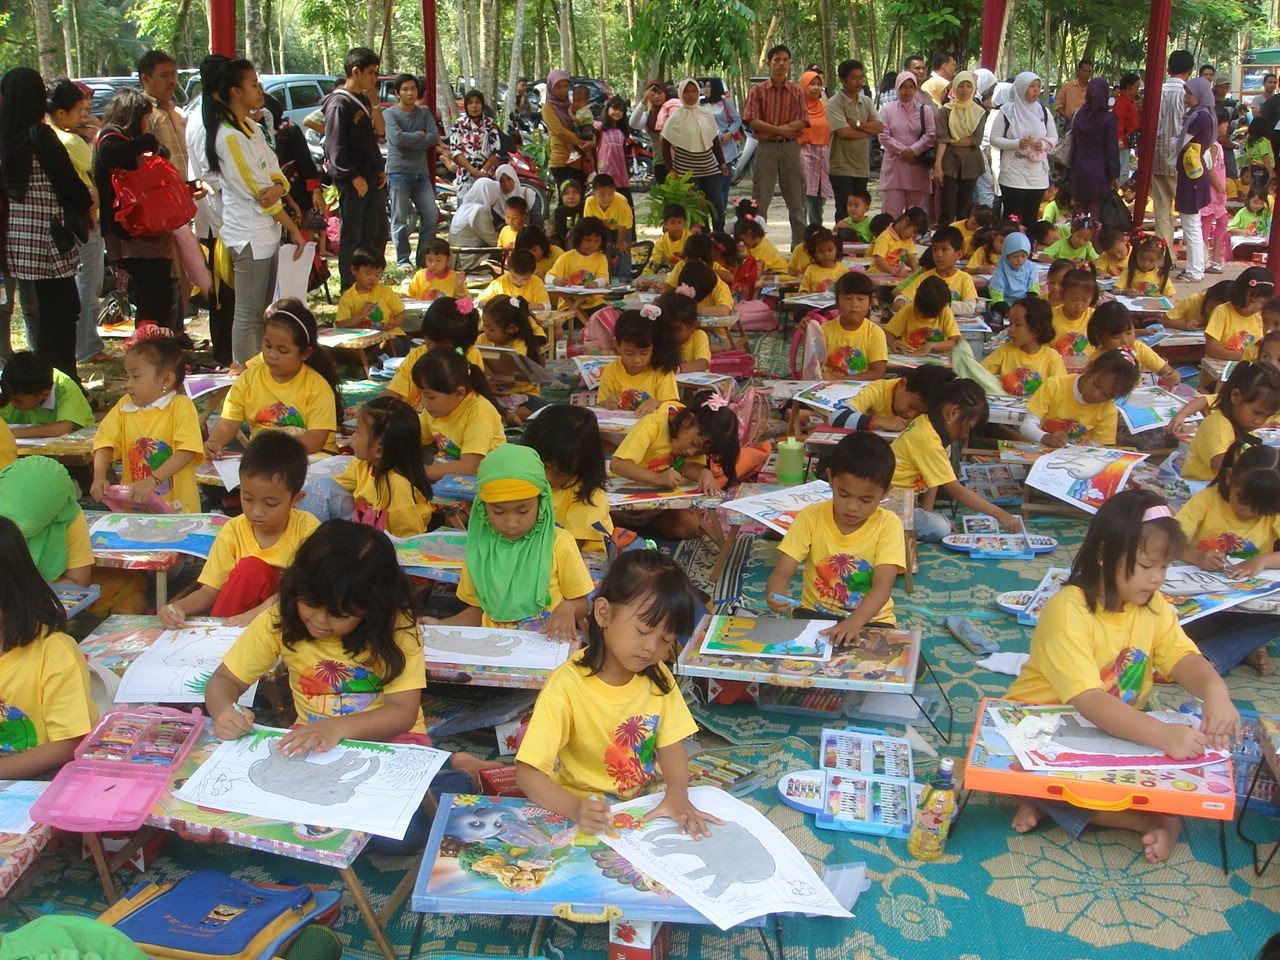 Mewarnai dan Menggambar Bersama Alam Peringatan Hari Lingkungan Hidup BLH Riau